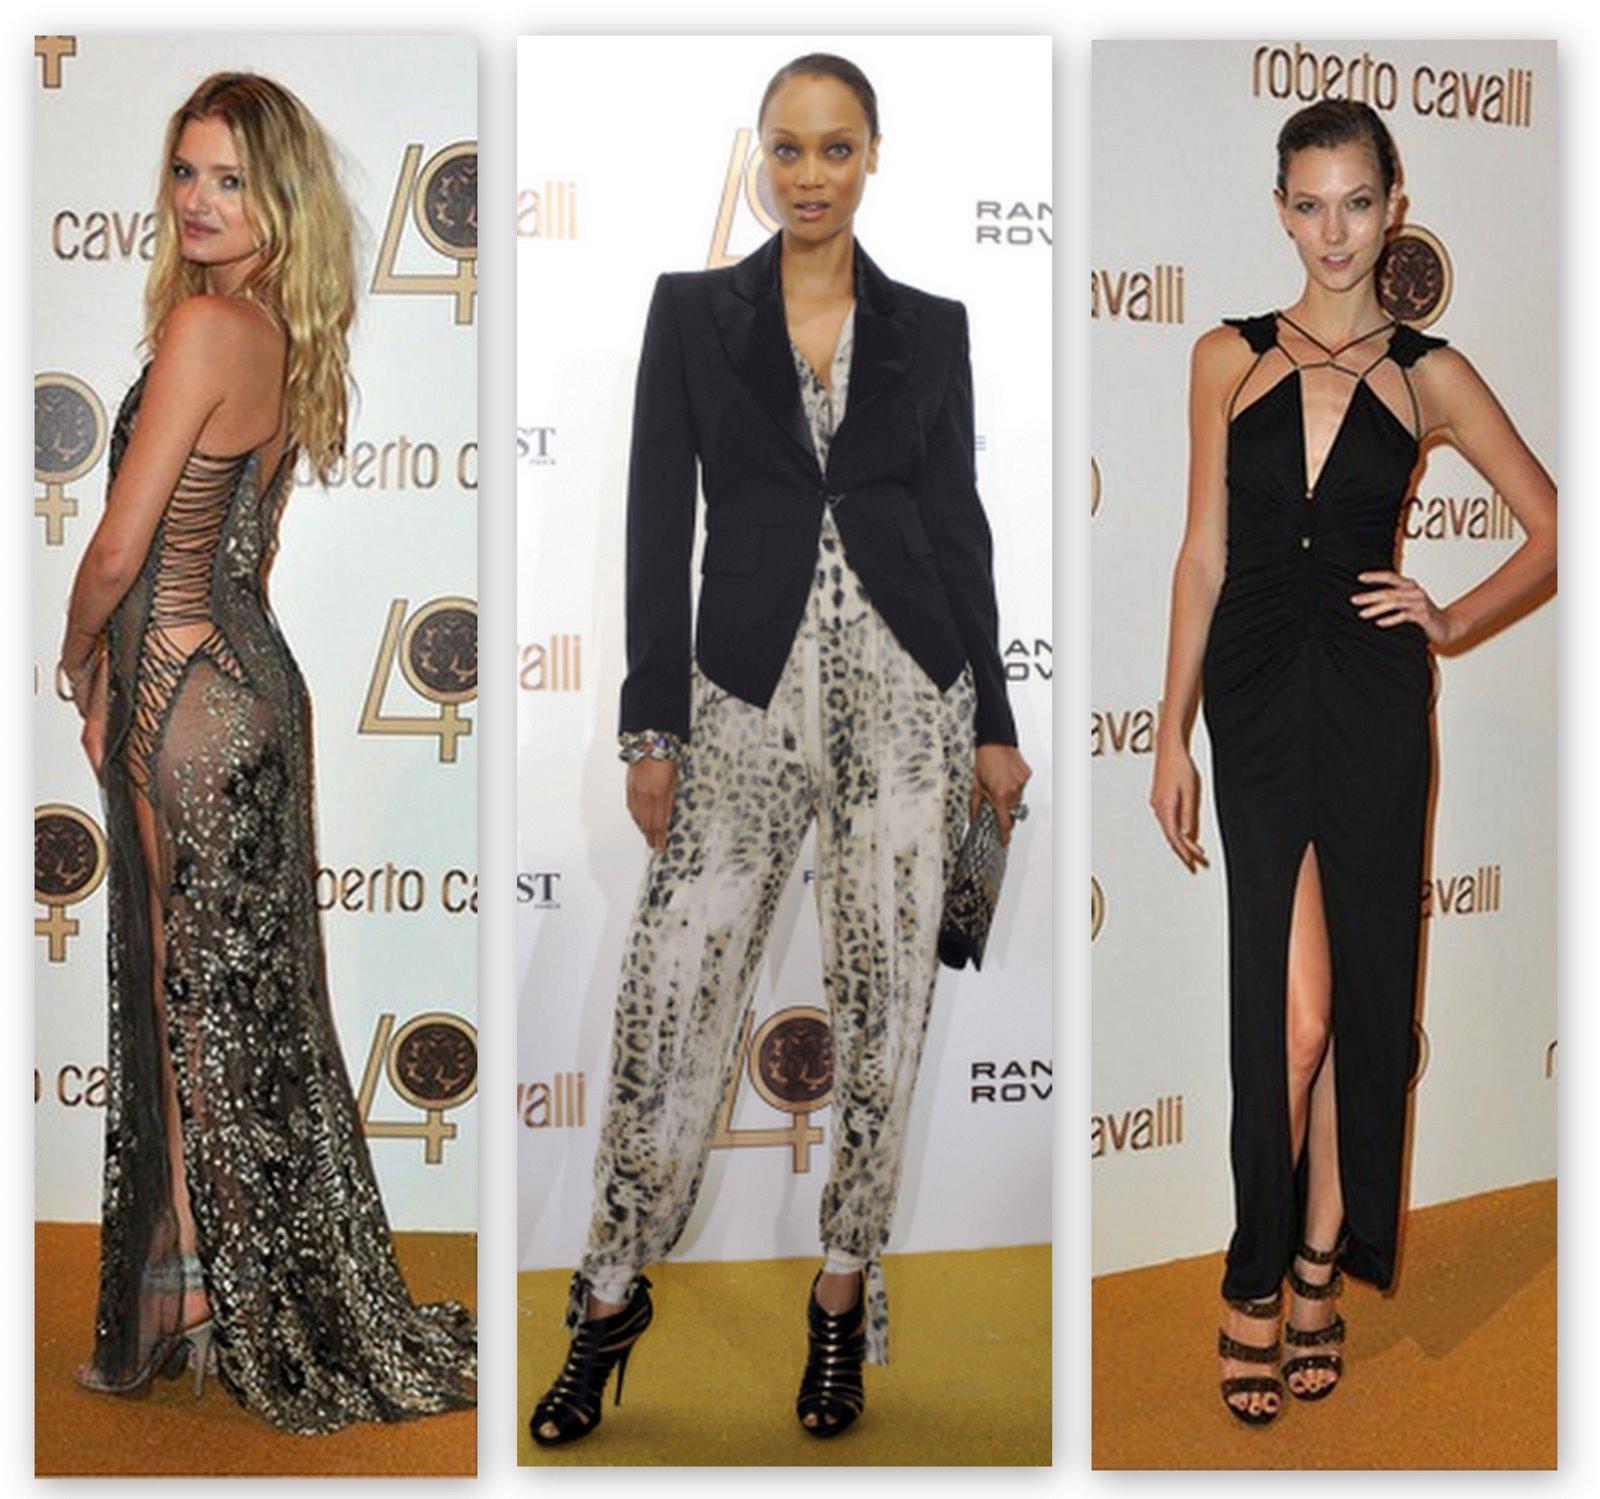 http://2.bp.blogspot.com/_xC9ozoZm8n4/TKgIJsd5STI/AAAAAAAABf4/d18GitVMMgk/s1600/The+Fashion+dealer+40th+anniversary+party+leona+lewish+roberto+cavalli+tyra+banks.jpg